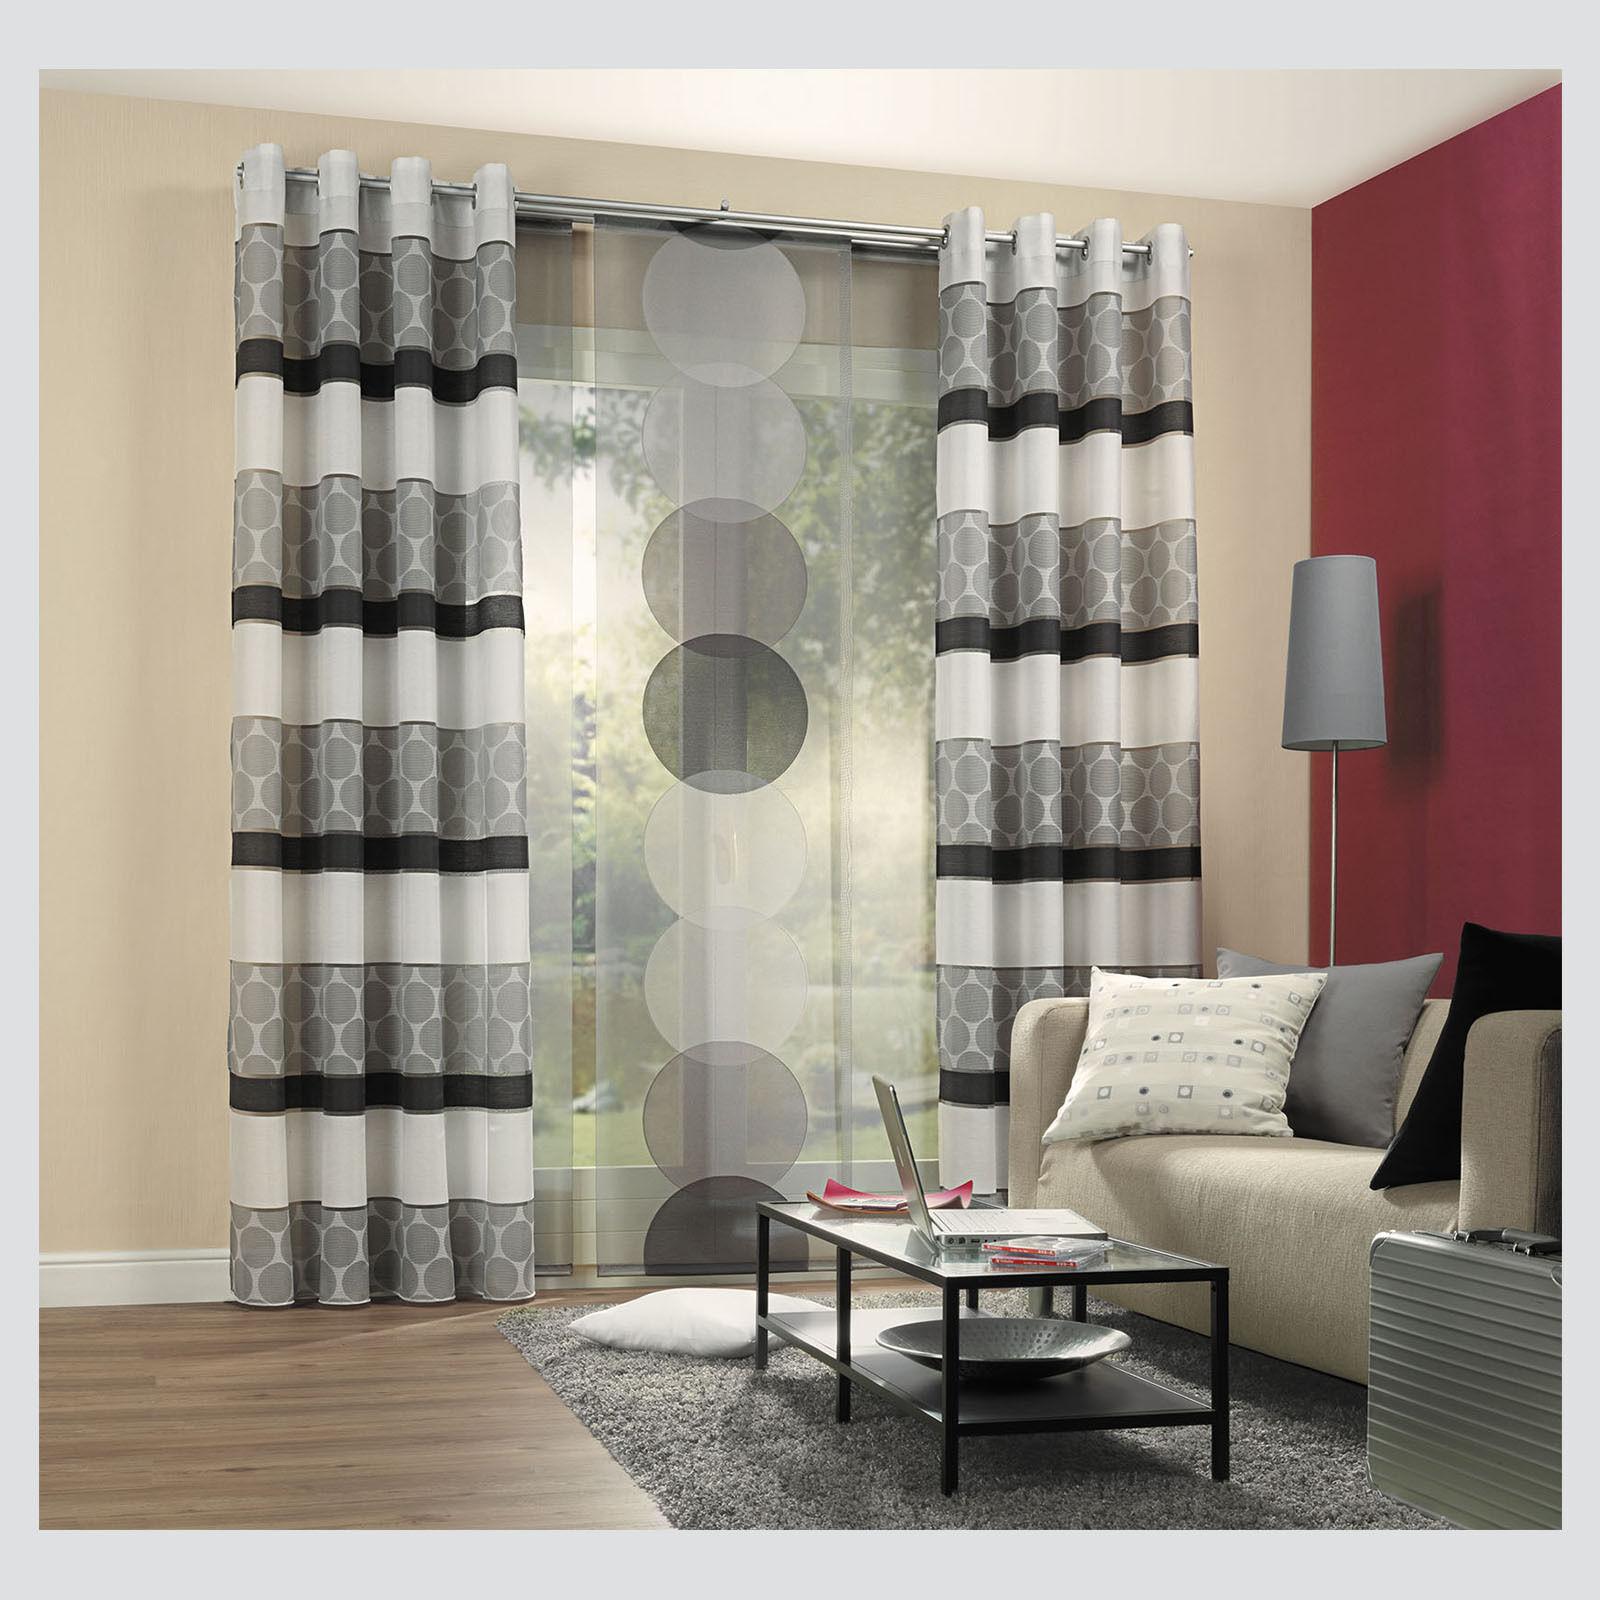 Dots schiebevorhang fl chenvorhang schiebegardine raumteiler paneele vorhang ebay - Deko vorhang raumteiler ...